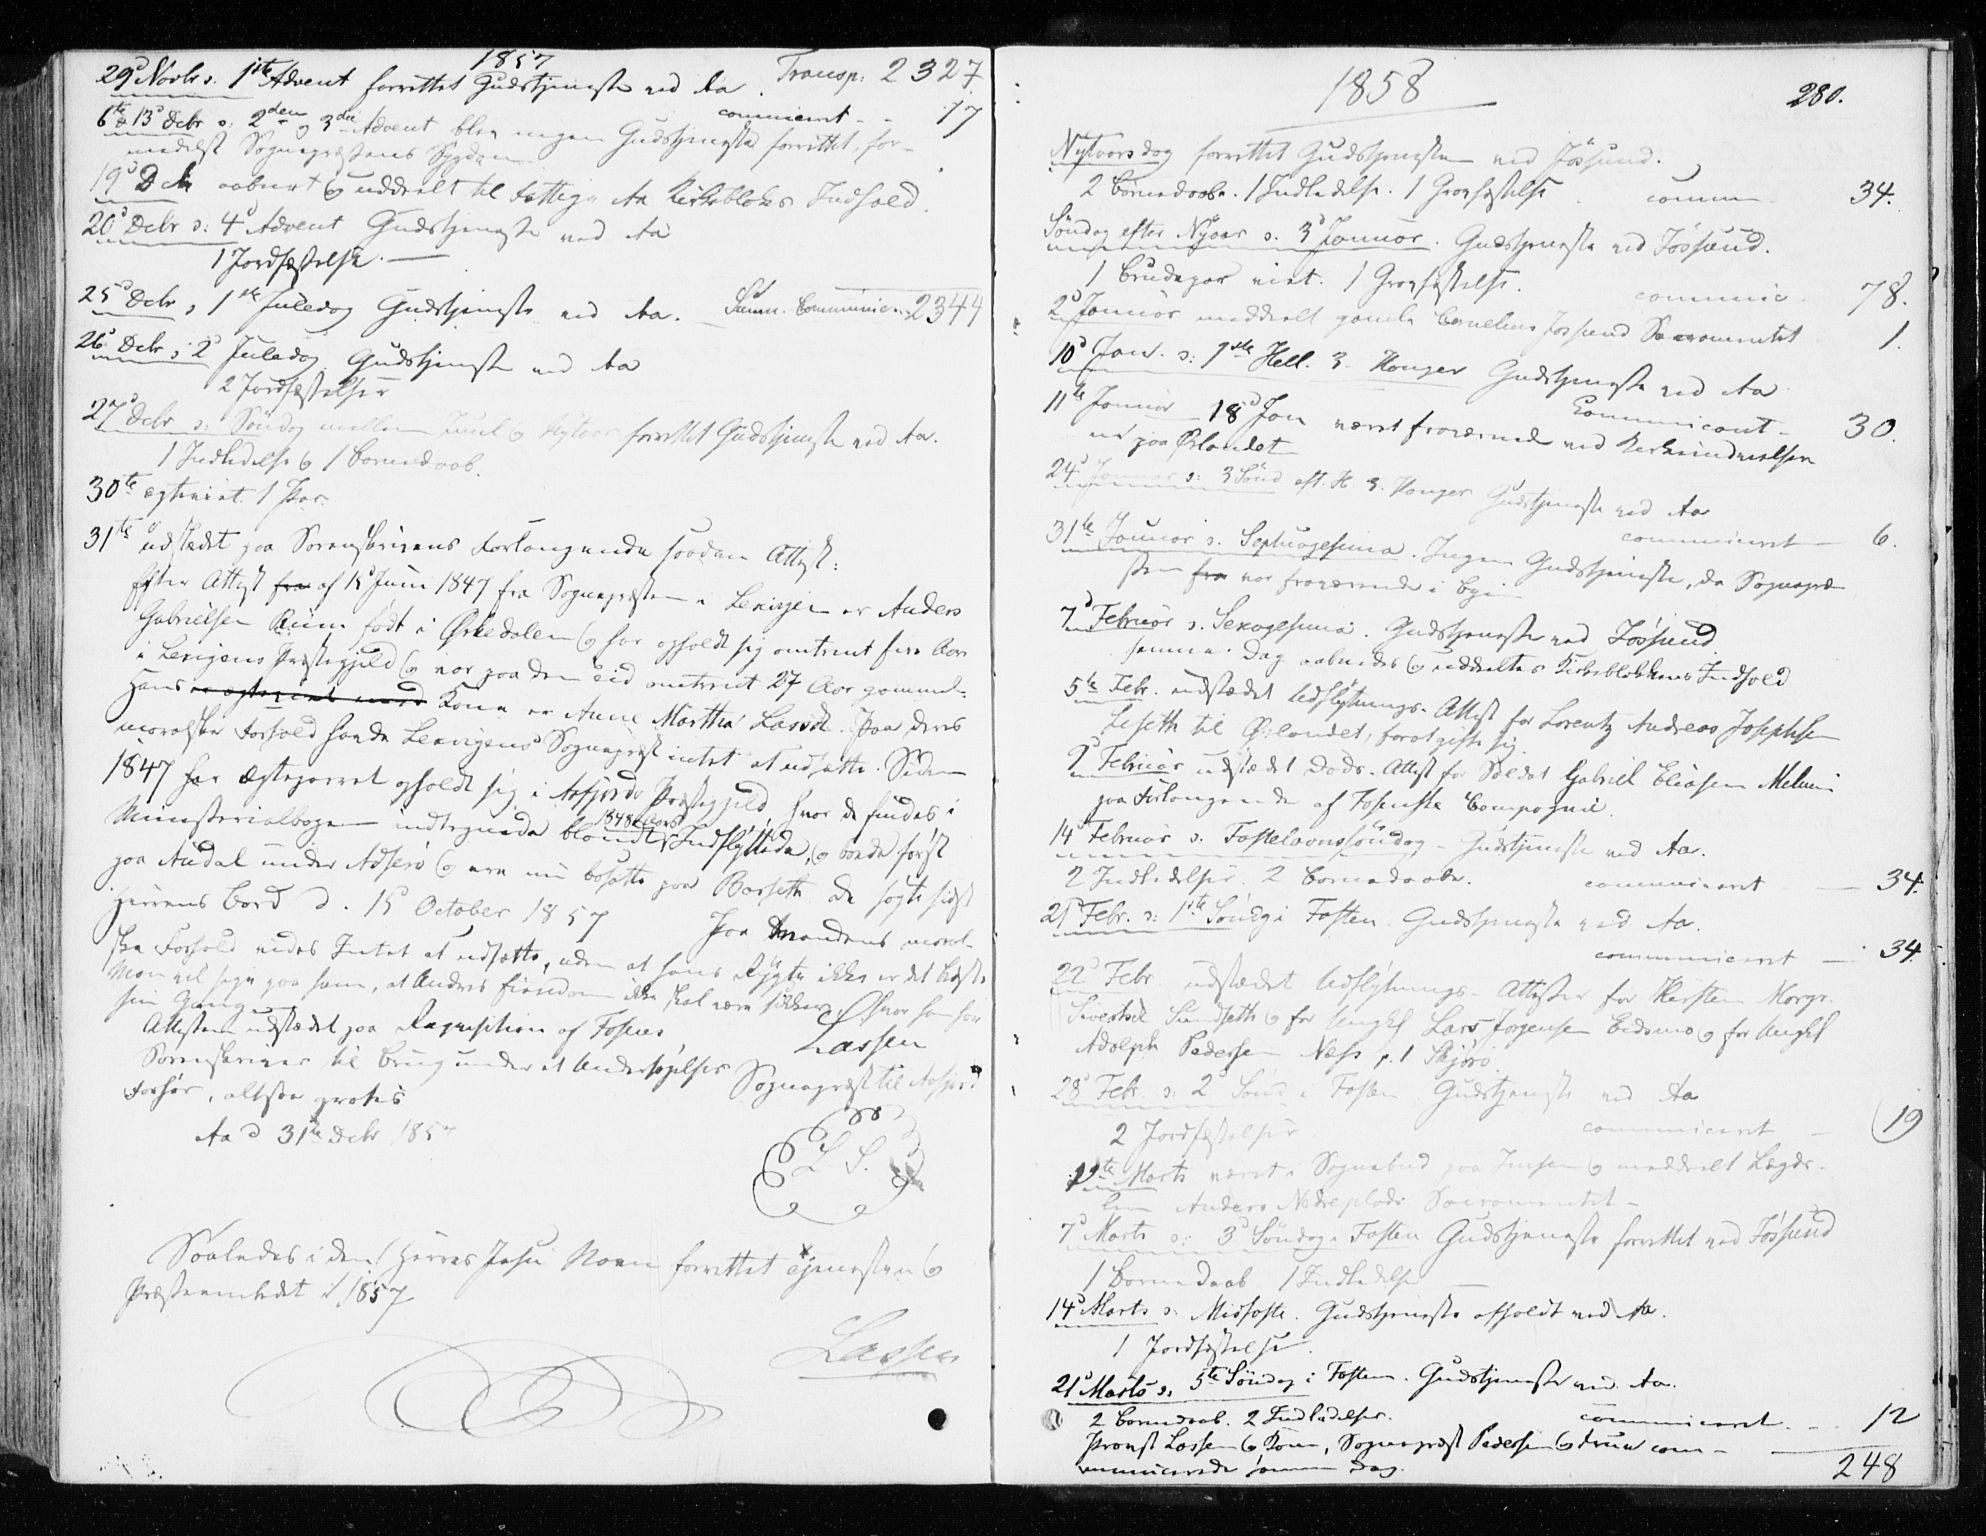 SAT, Ministerialprotokoller, klokkerbøker og fødselsregistre - Sør-Trøndelag, 655/L0677: Parish register (official) no. 655A06, 1847-1860, p. 280